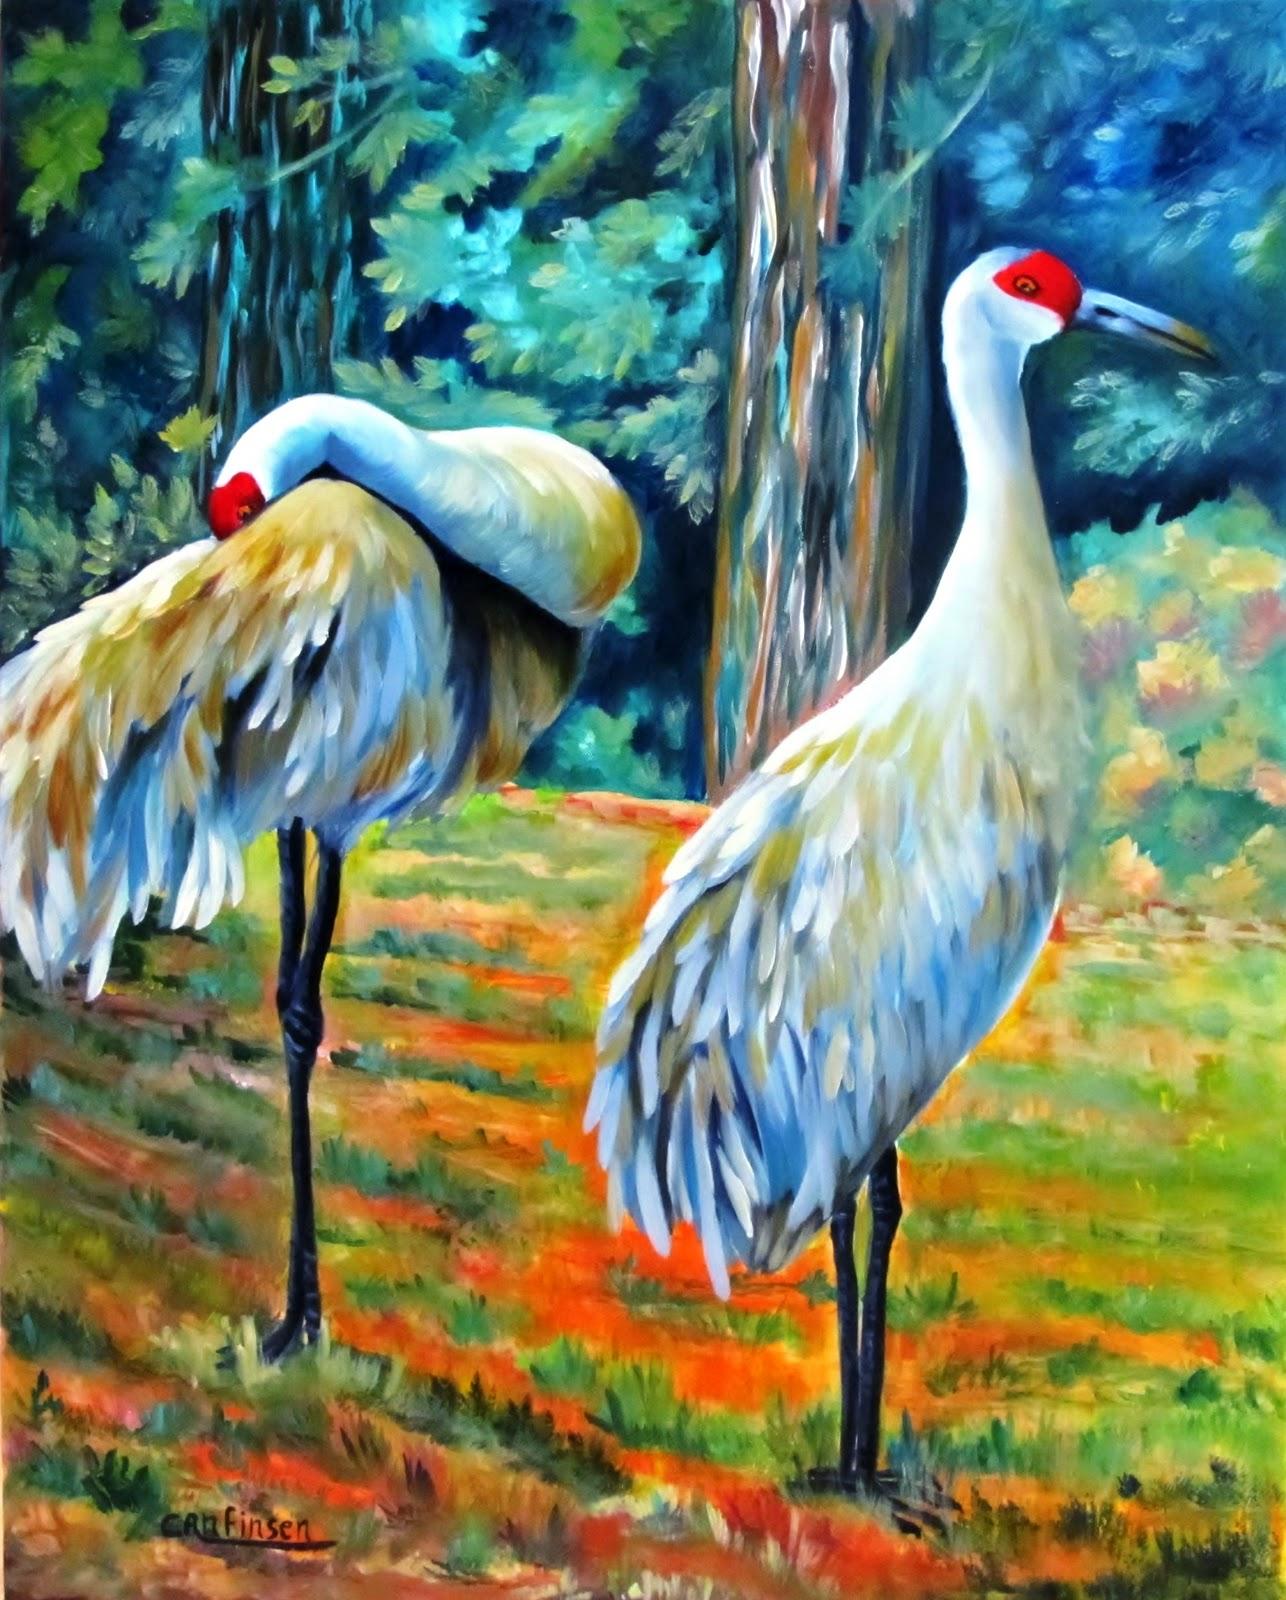 It Was Twilight And Sandhill Cranes >> Anfinsen Arts Alive Sandhill Cranes On The Chopping Block